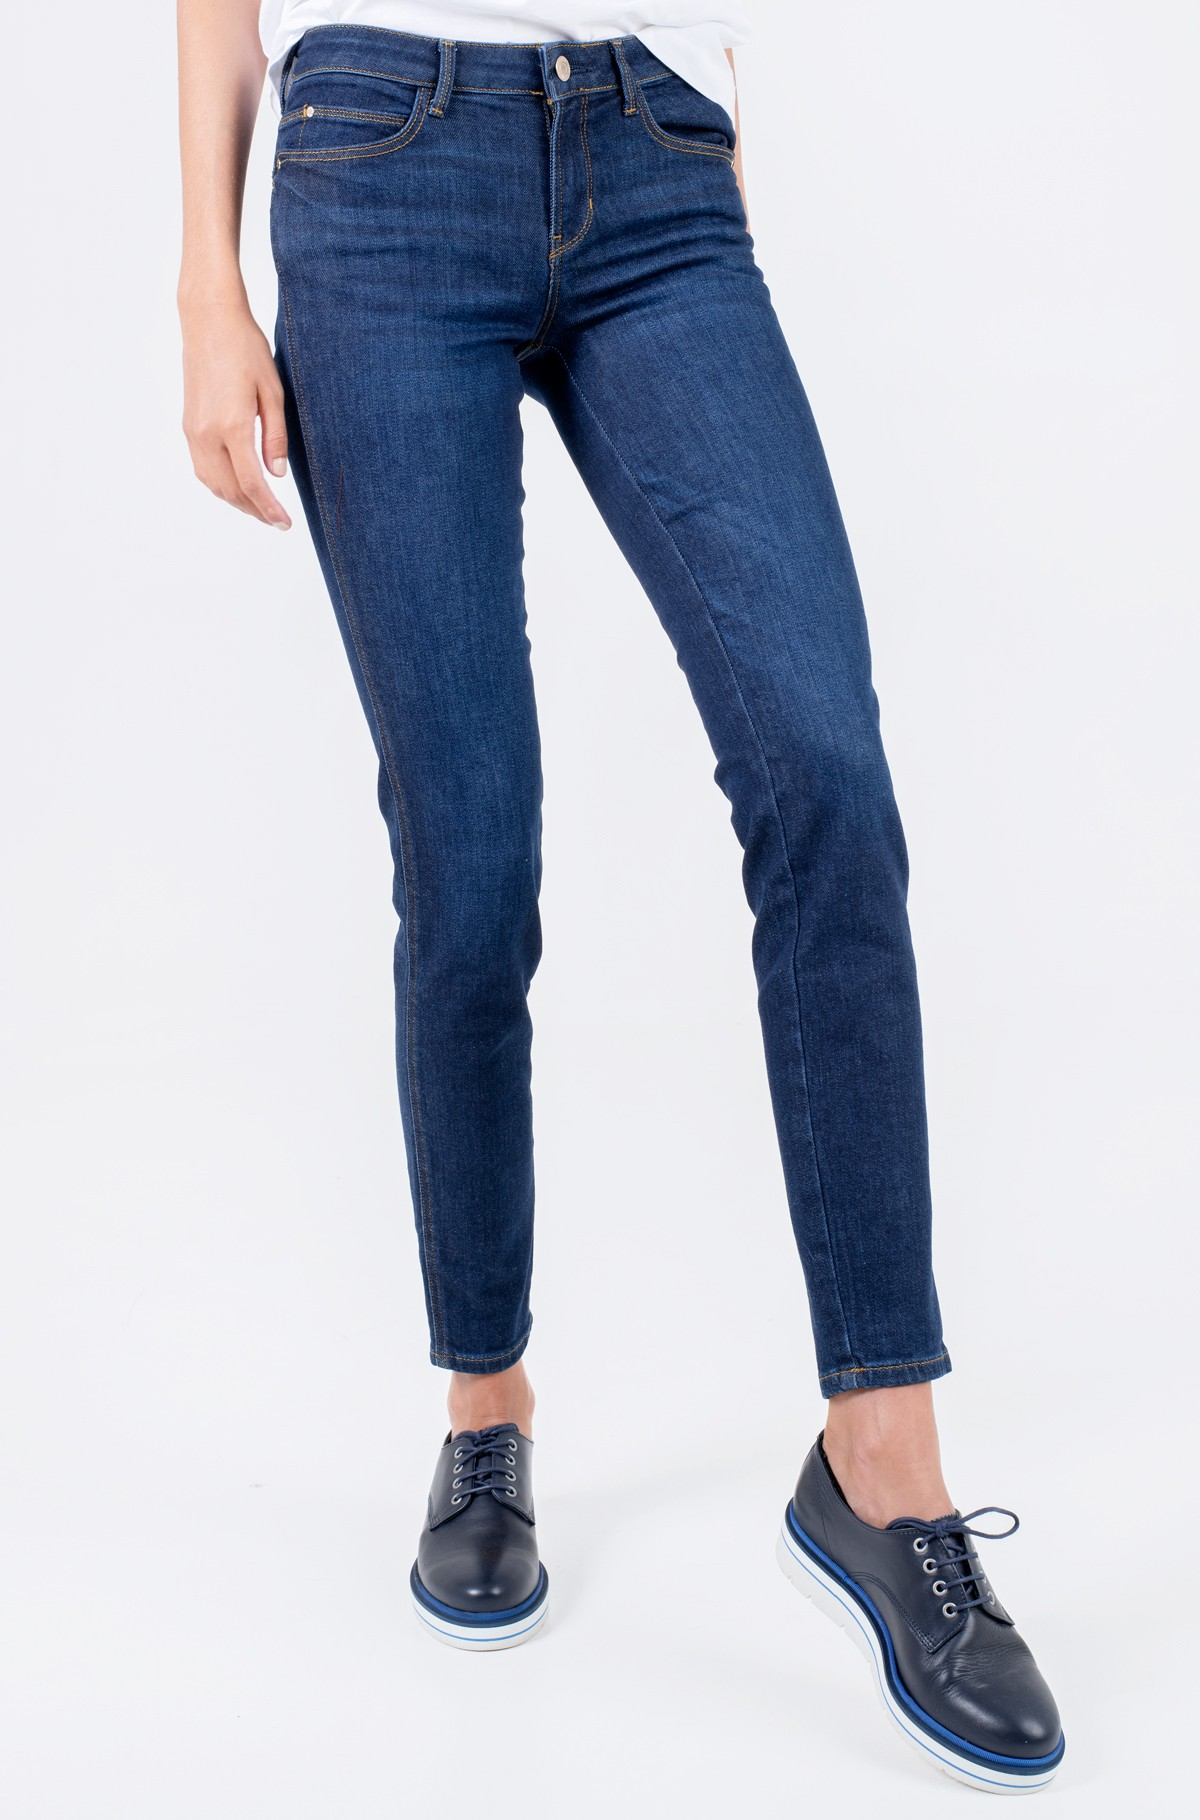 Jeans W1YAJ2 D4GV1-full-1